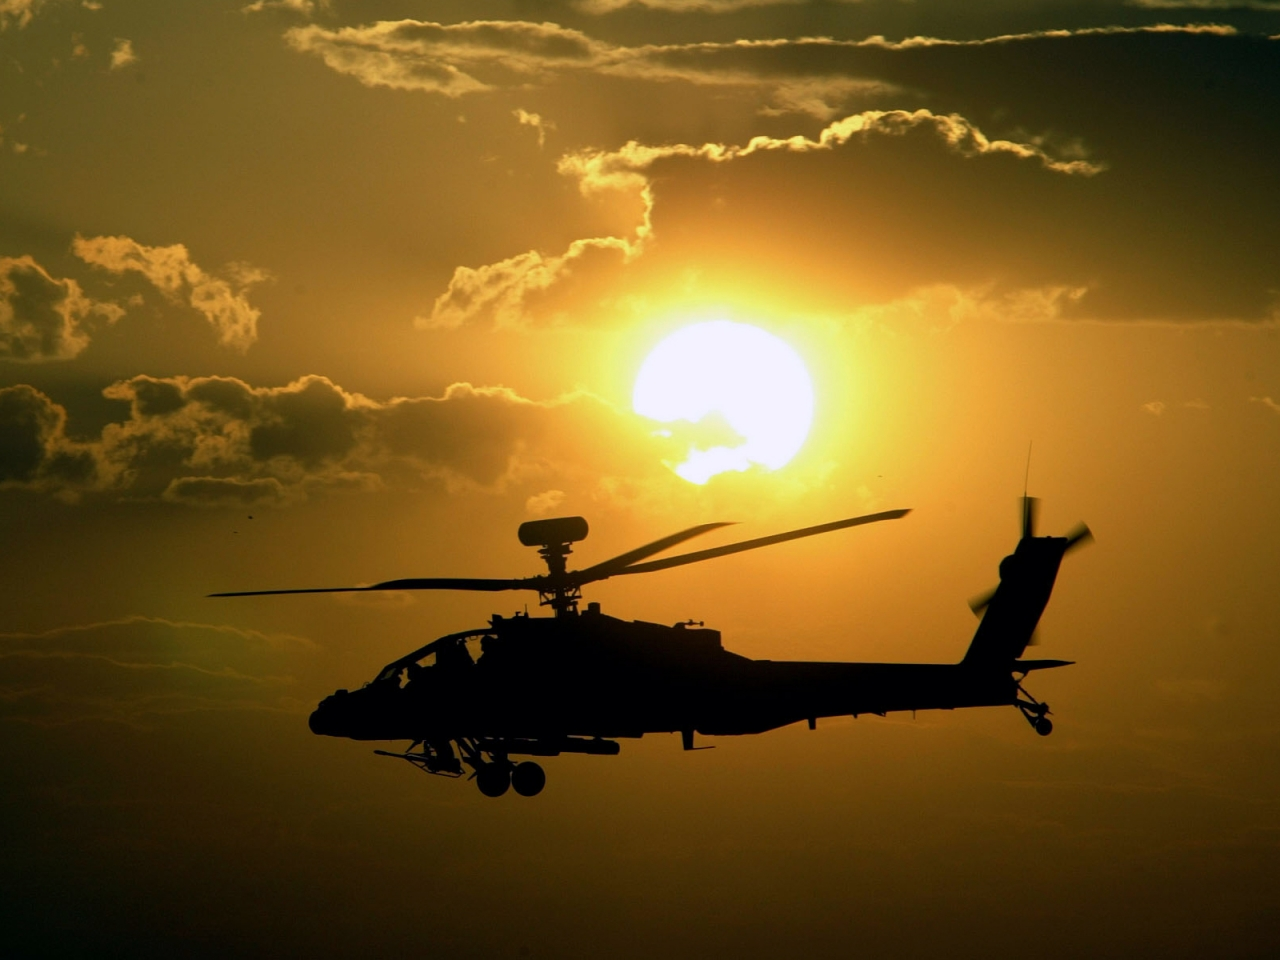 Helicóptero AH 64 Apache - 1280x960